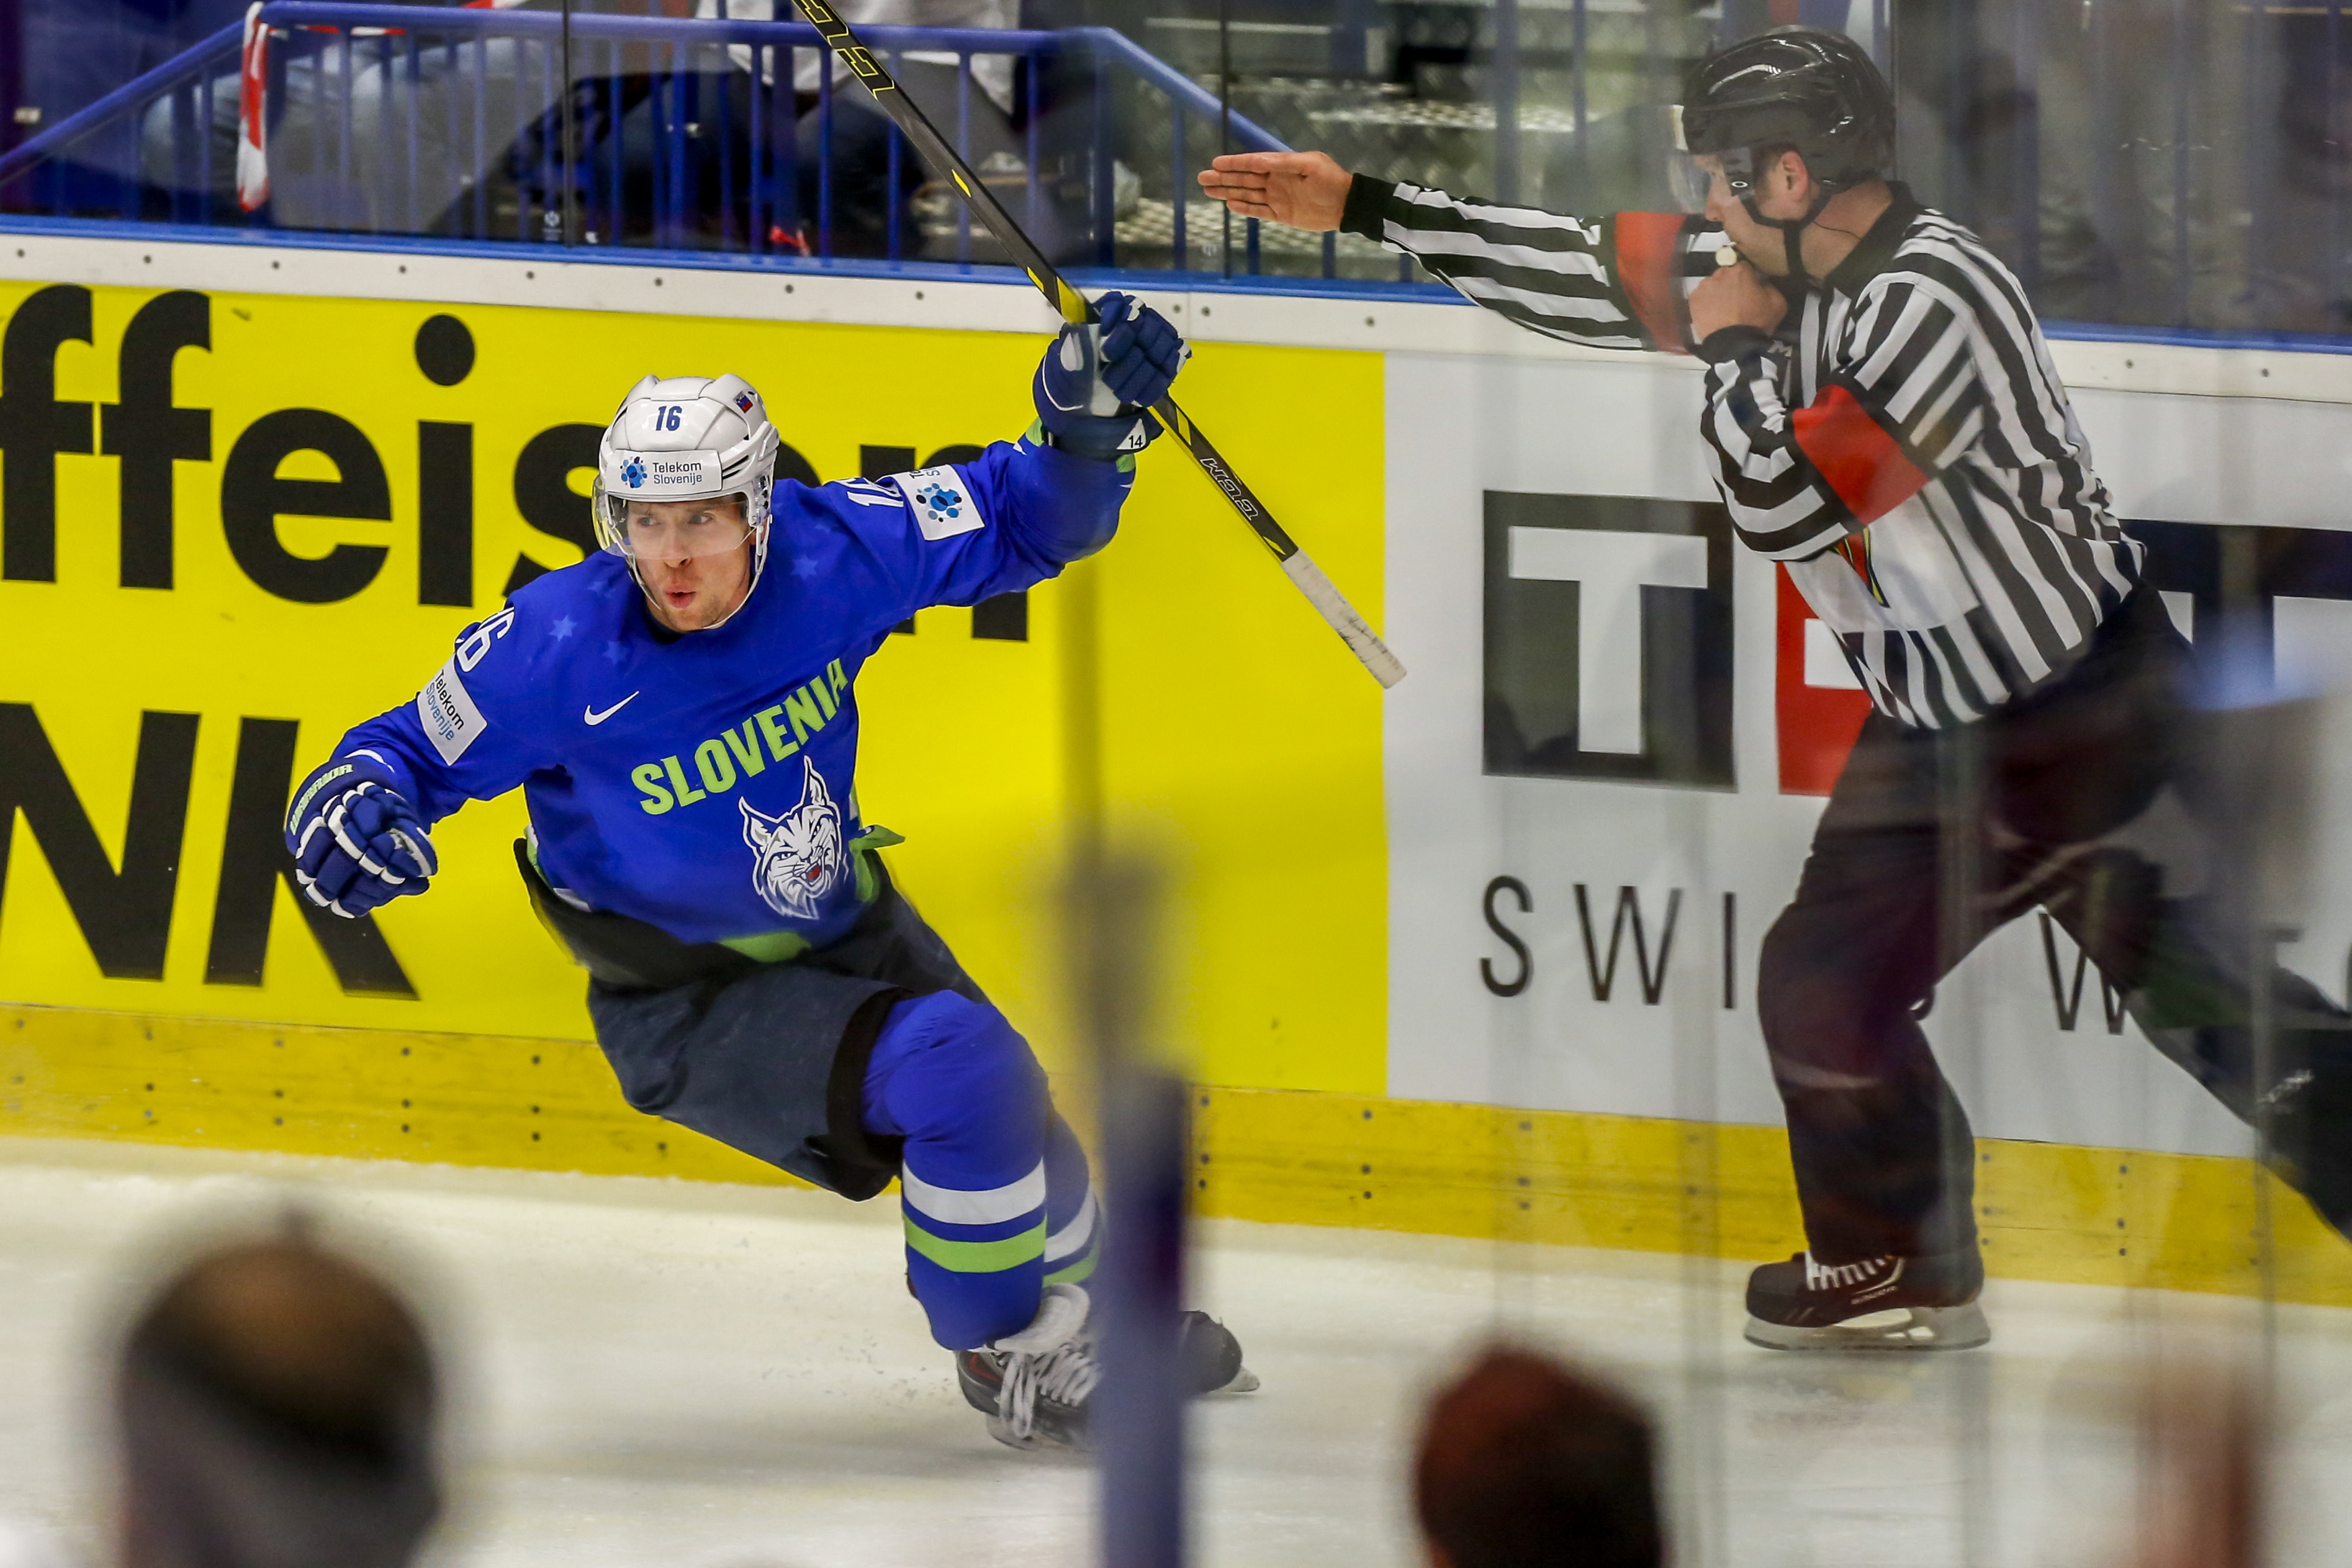 Франция словения хоккей прогнозы [PUNIQRANDLINE-(au-dating-names.txt) 43